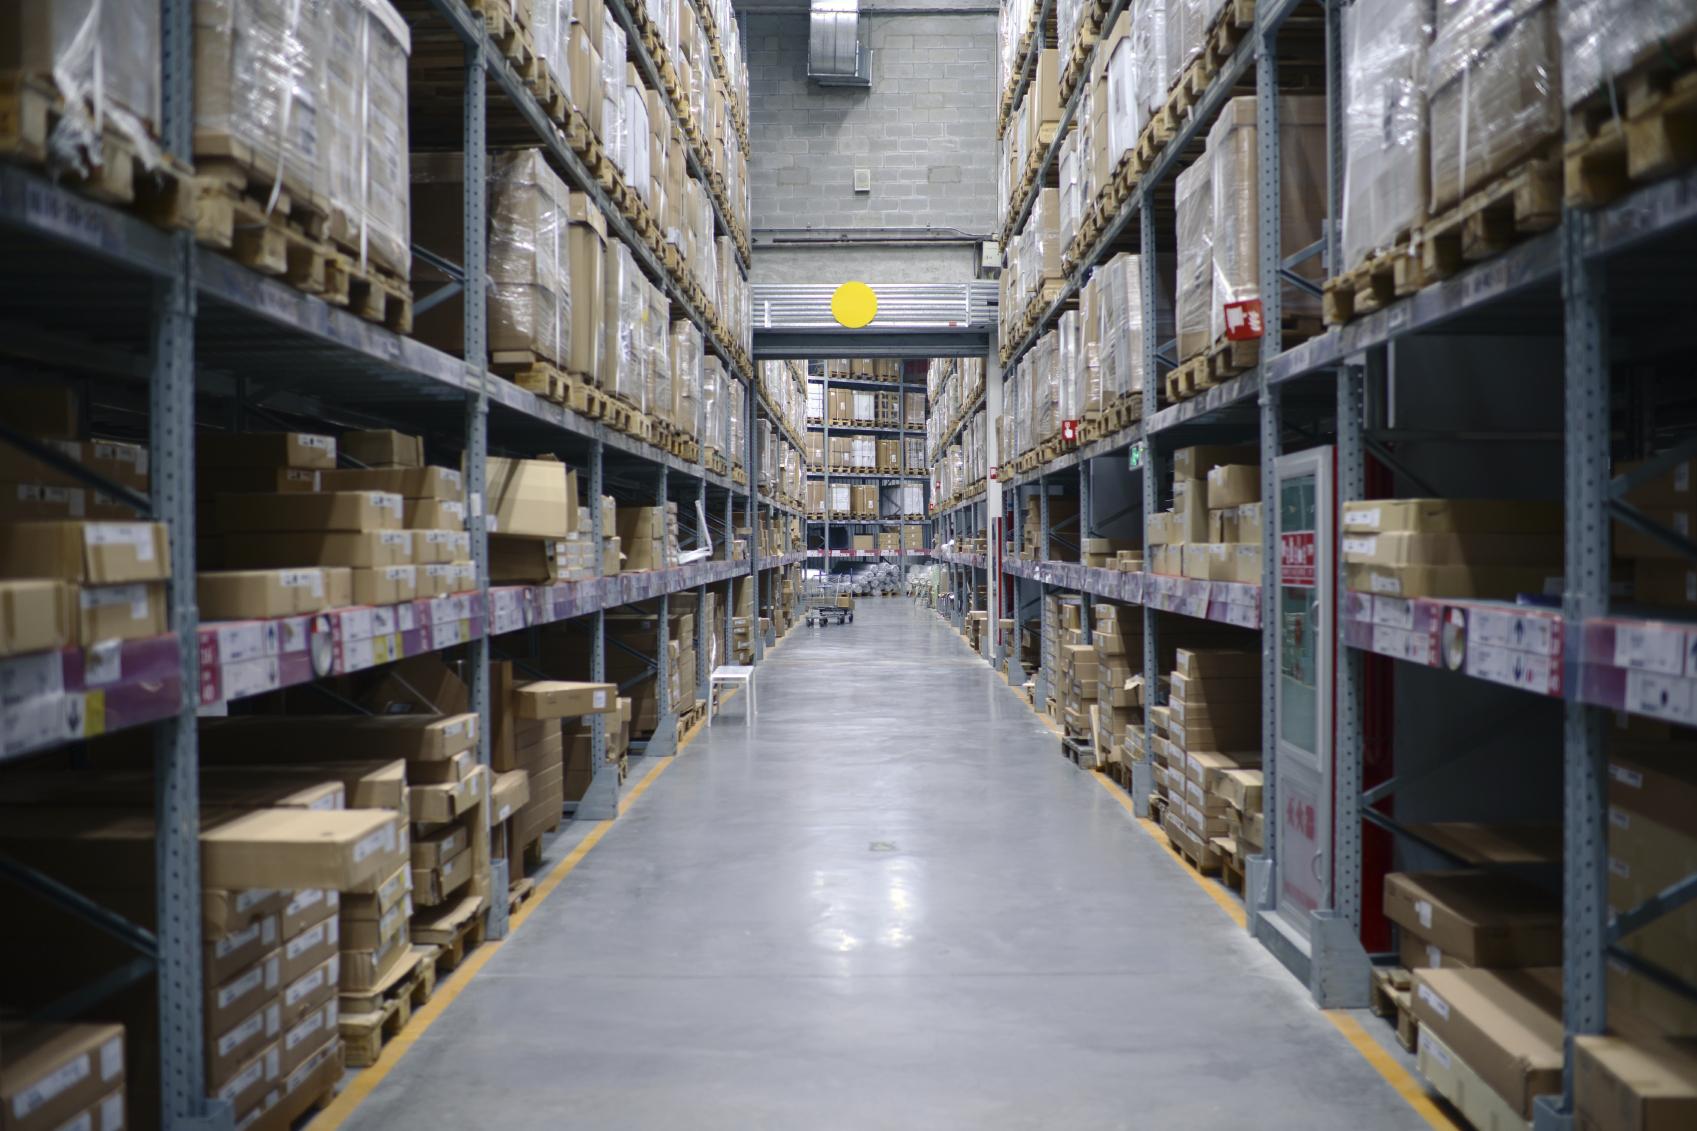 Warehouses Take Stock of Big Data